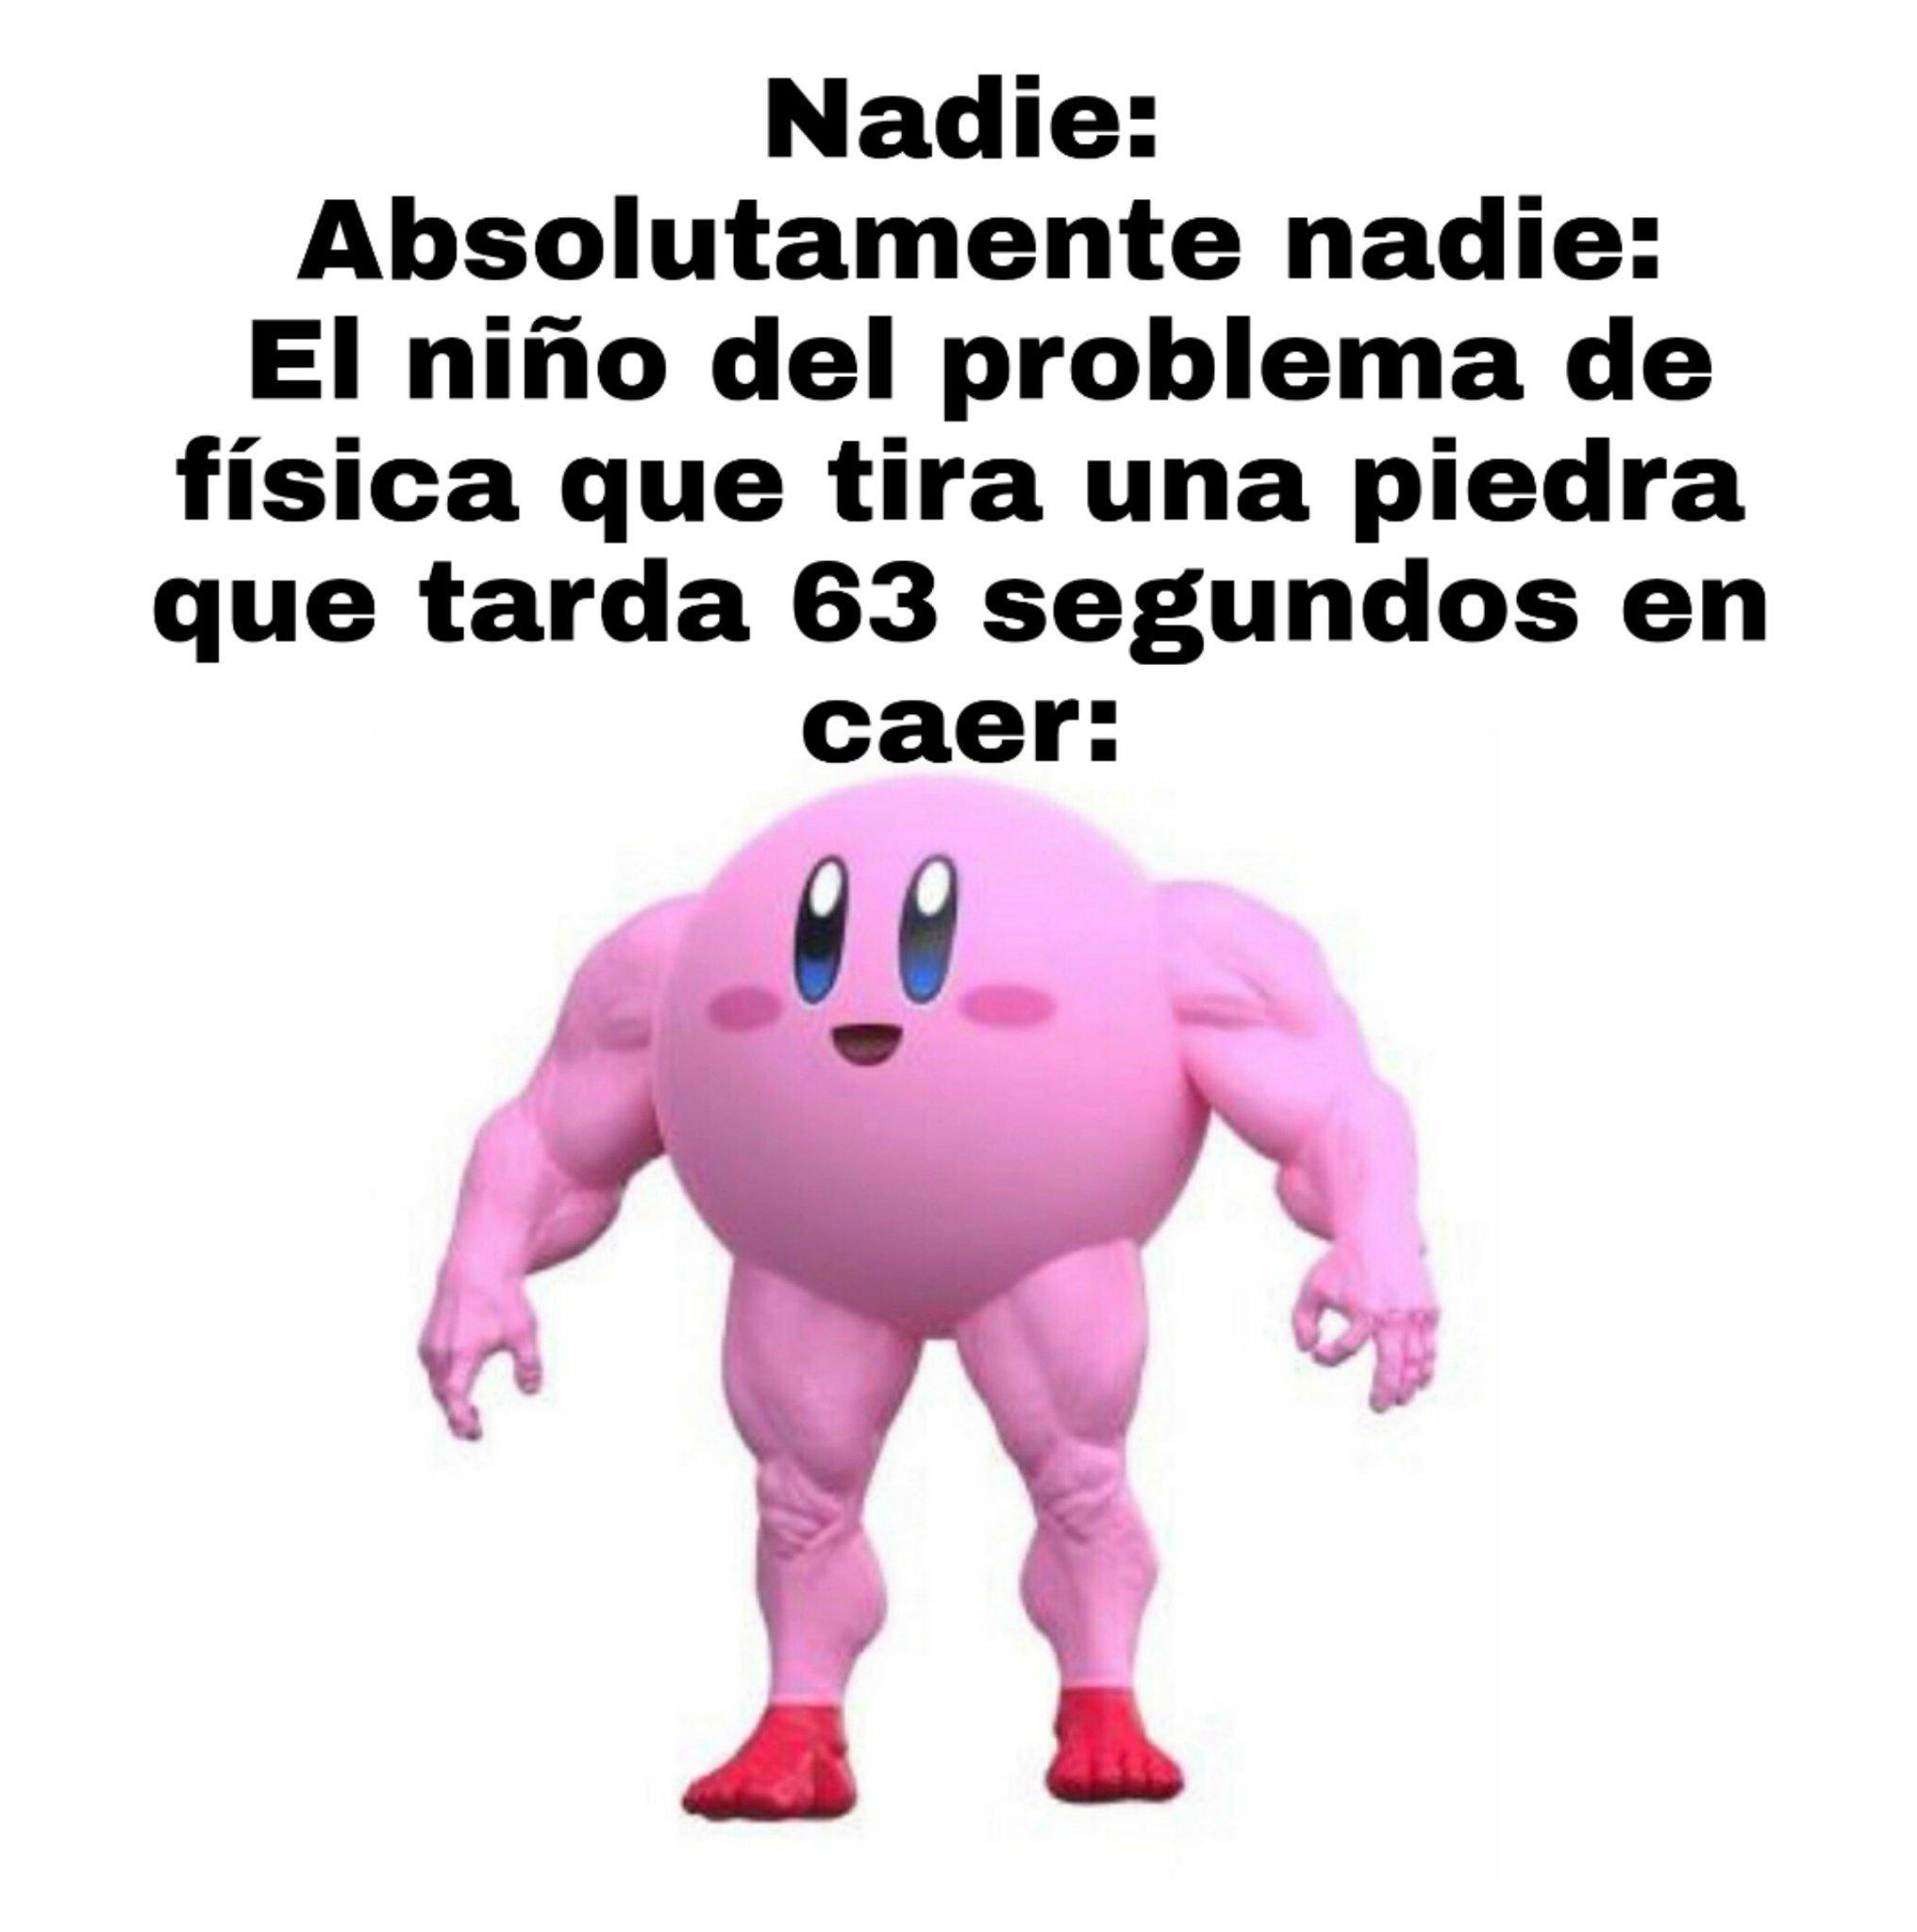 ESTOY MAMADISIMO HDTPM - meme